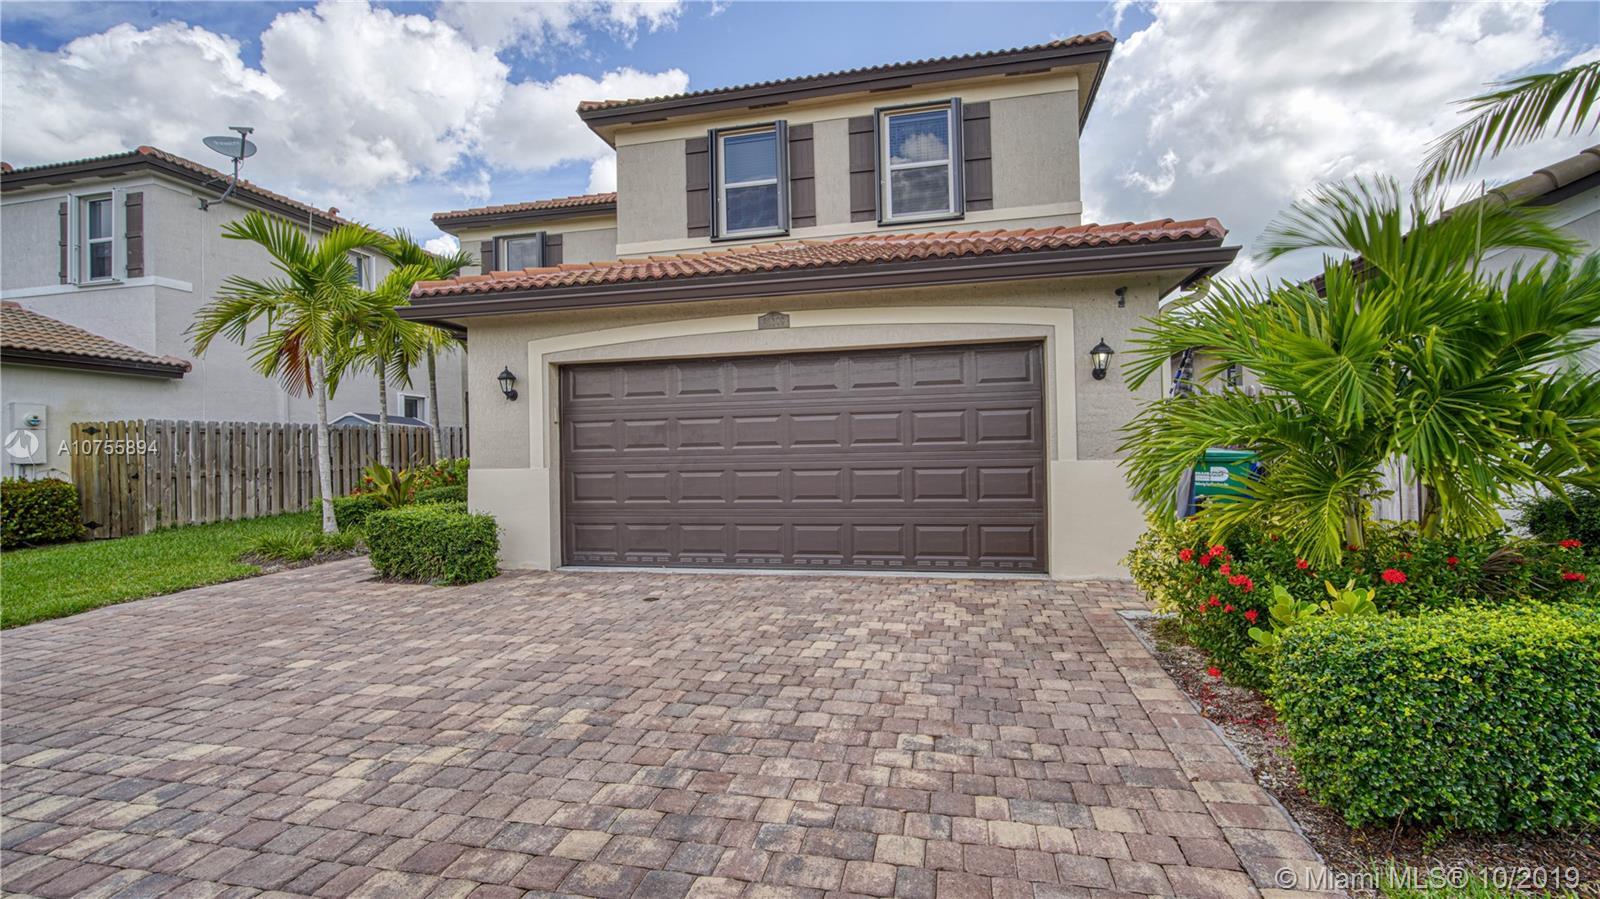 25309 SW 118th Ct, Homestead, FL 33032 - Homestead, FL real estate listing